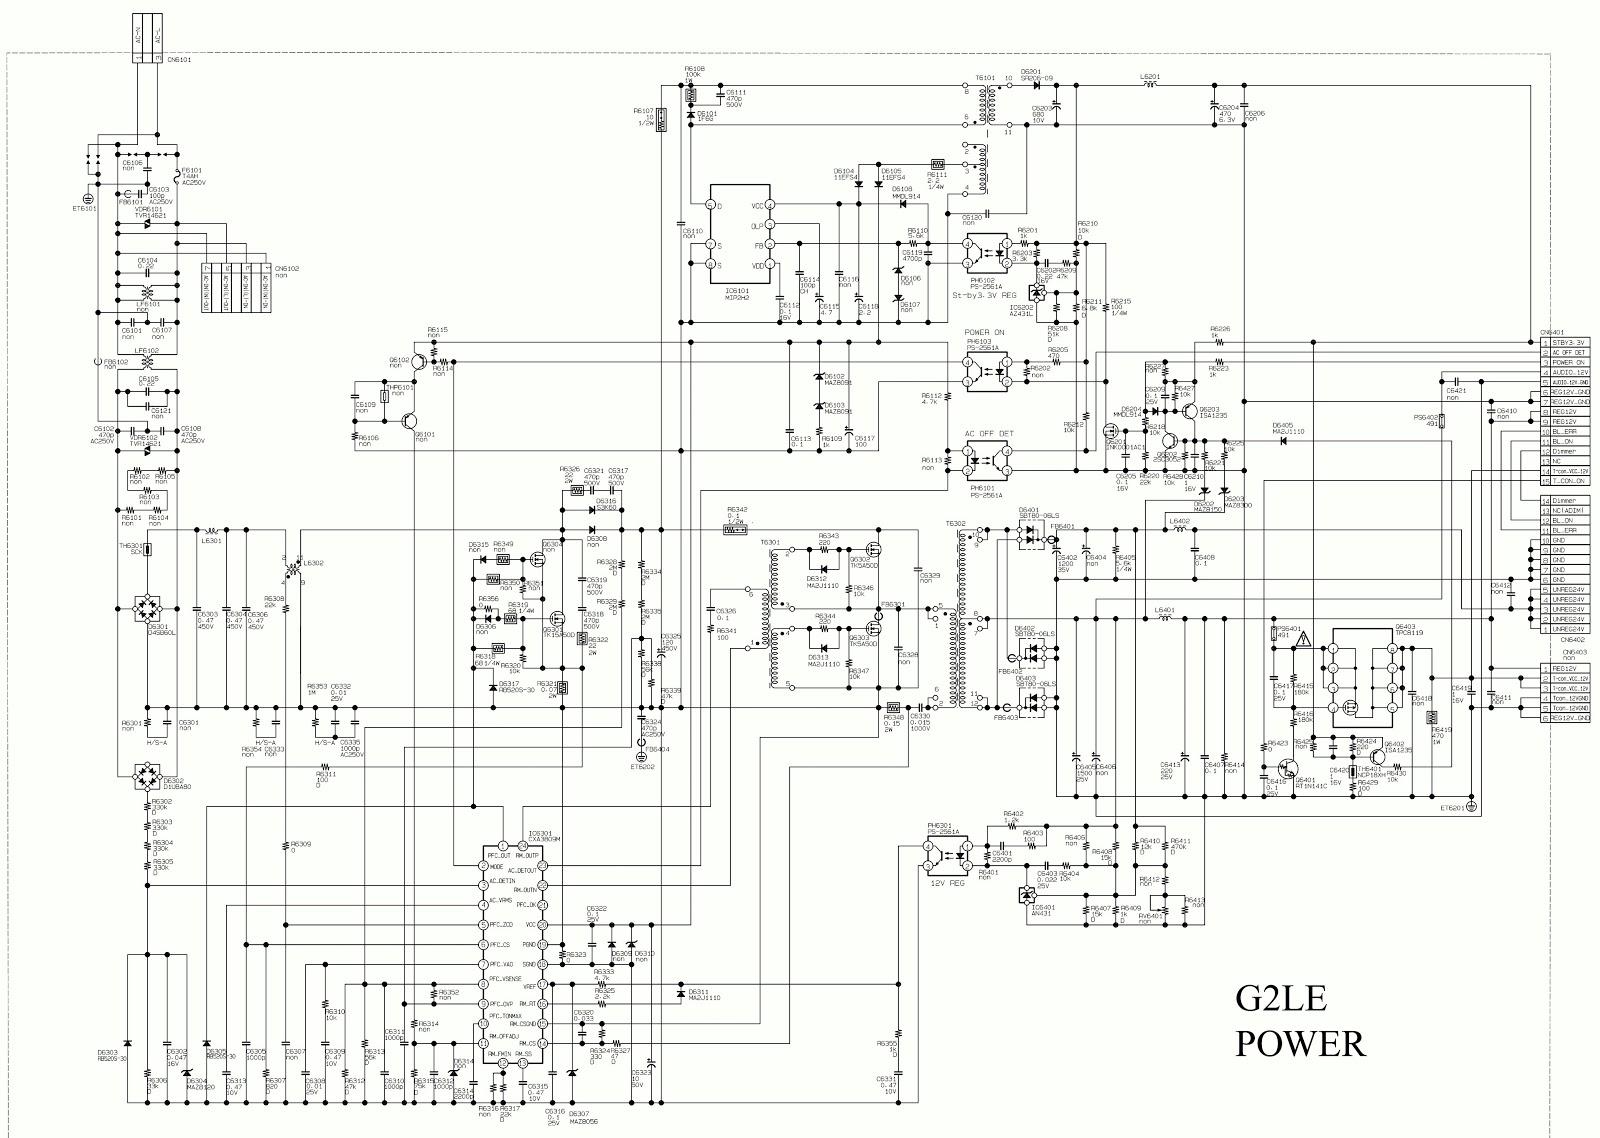 Electro Help Sony Kdl22bx300 Sony Kdl 32bx300 Lcd Tv